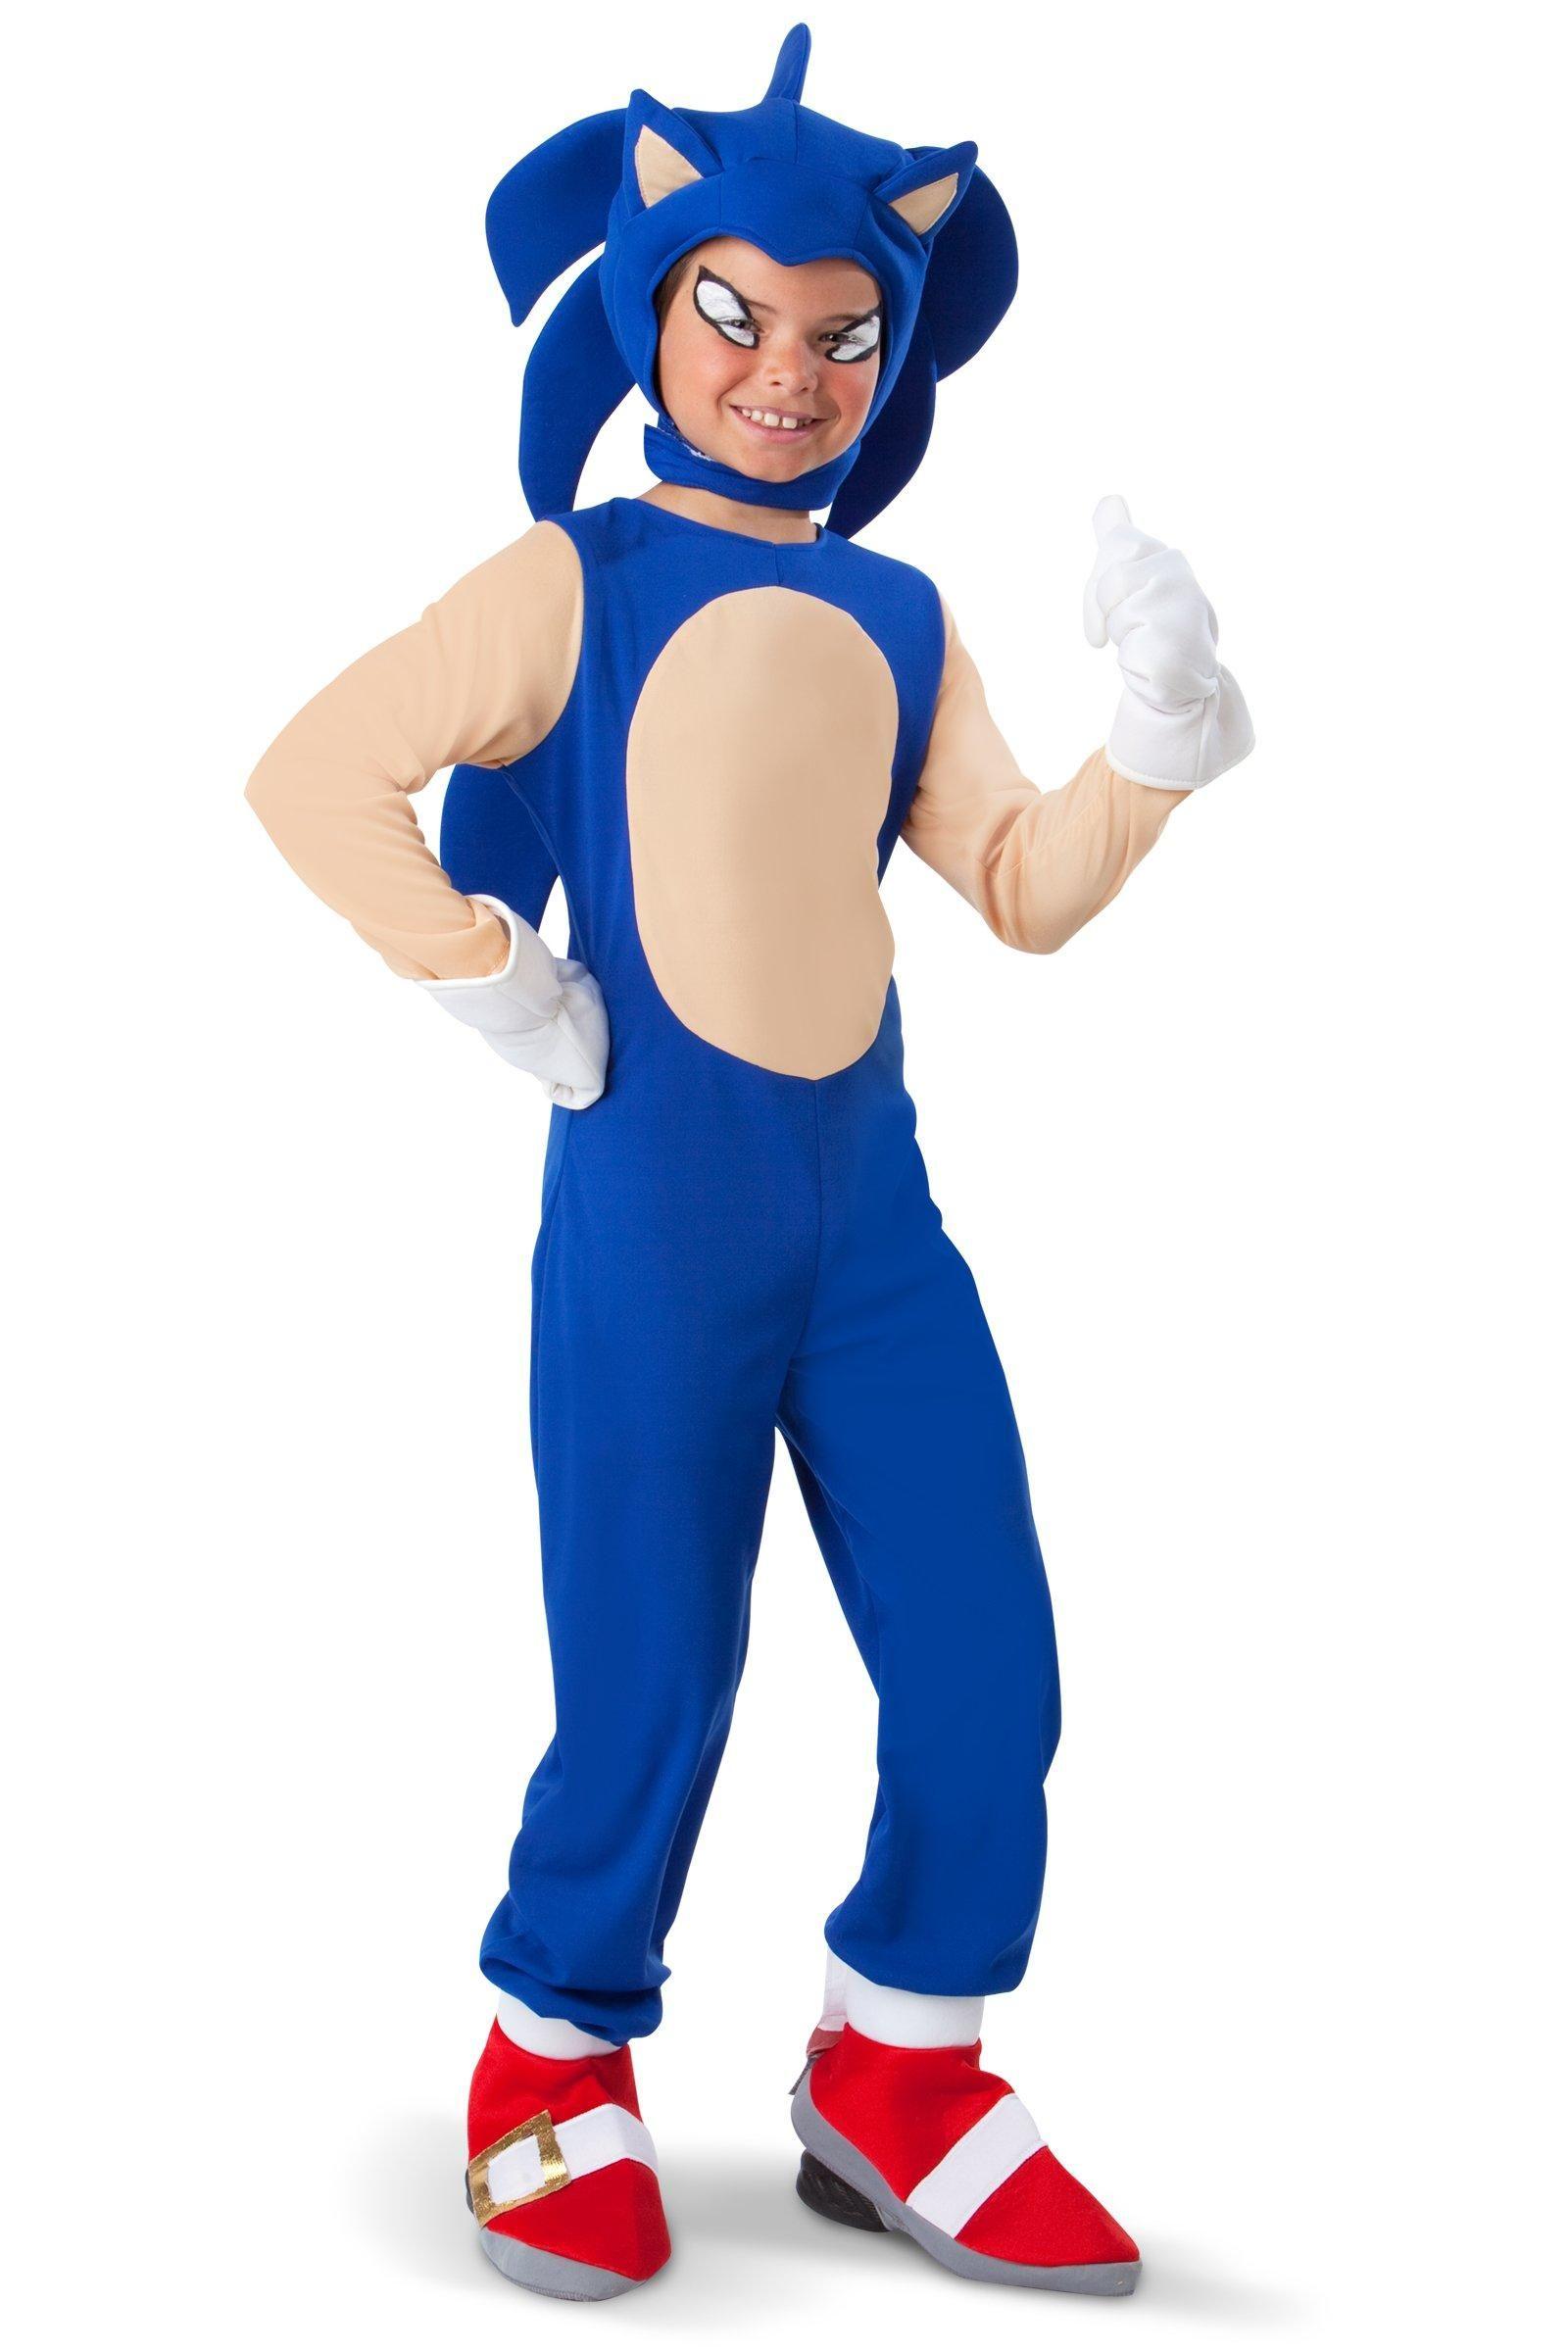 Sonic The Hedgehog Sonic Kids Costume Sonic The Hedgehog Halloween Costume Sonic Costume Sonic The Hedgehog Halloween